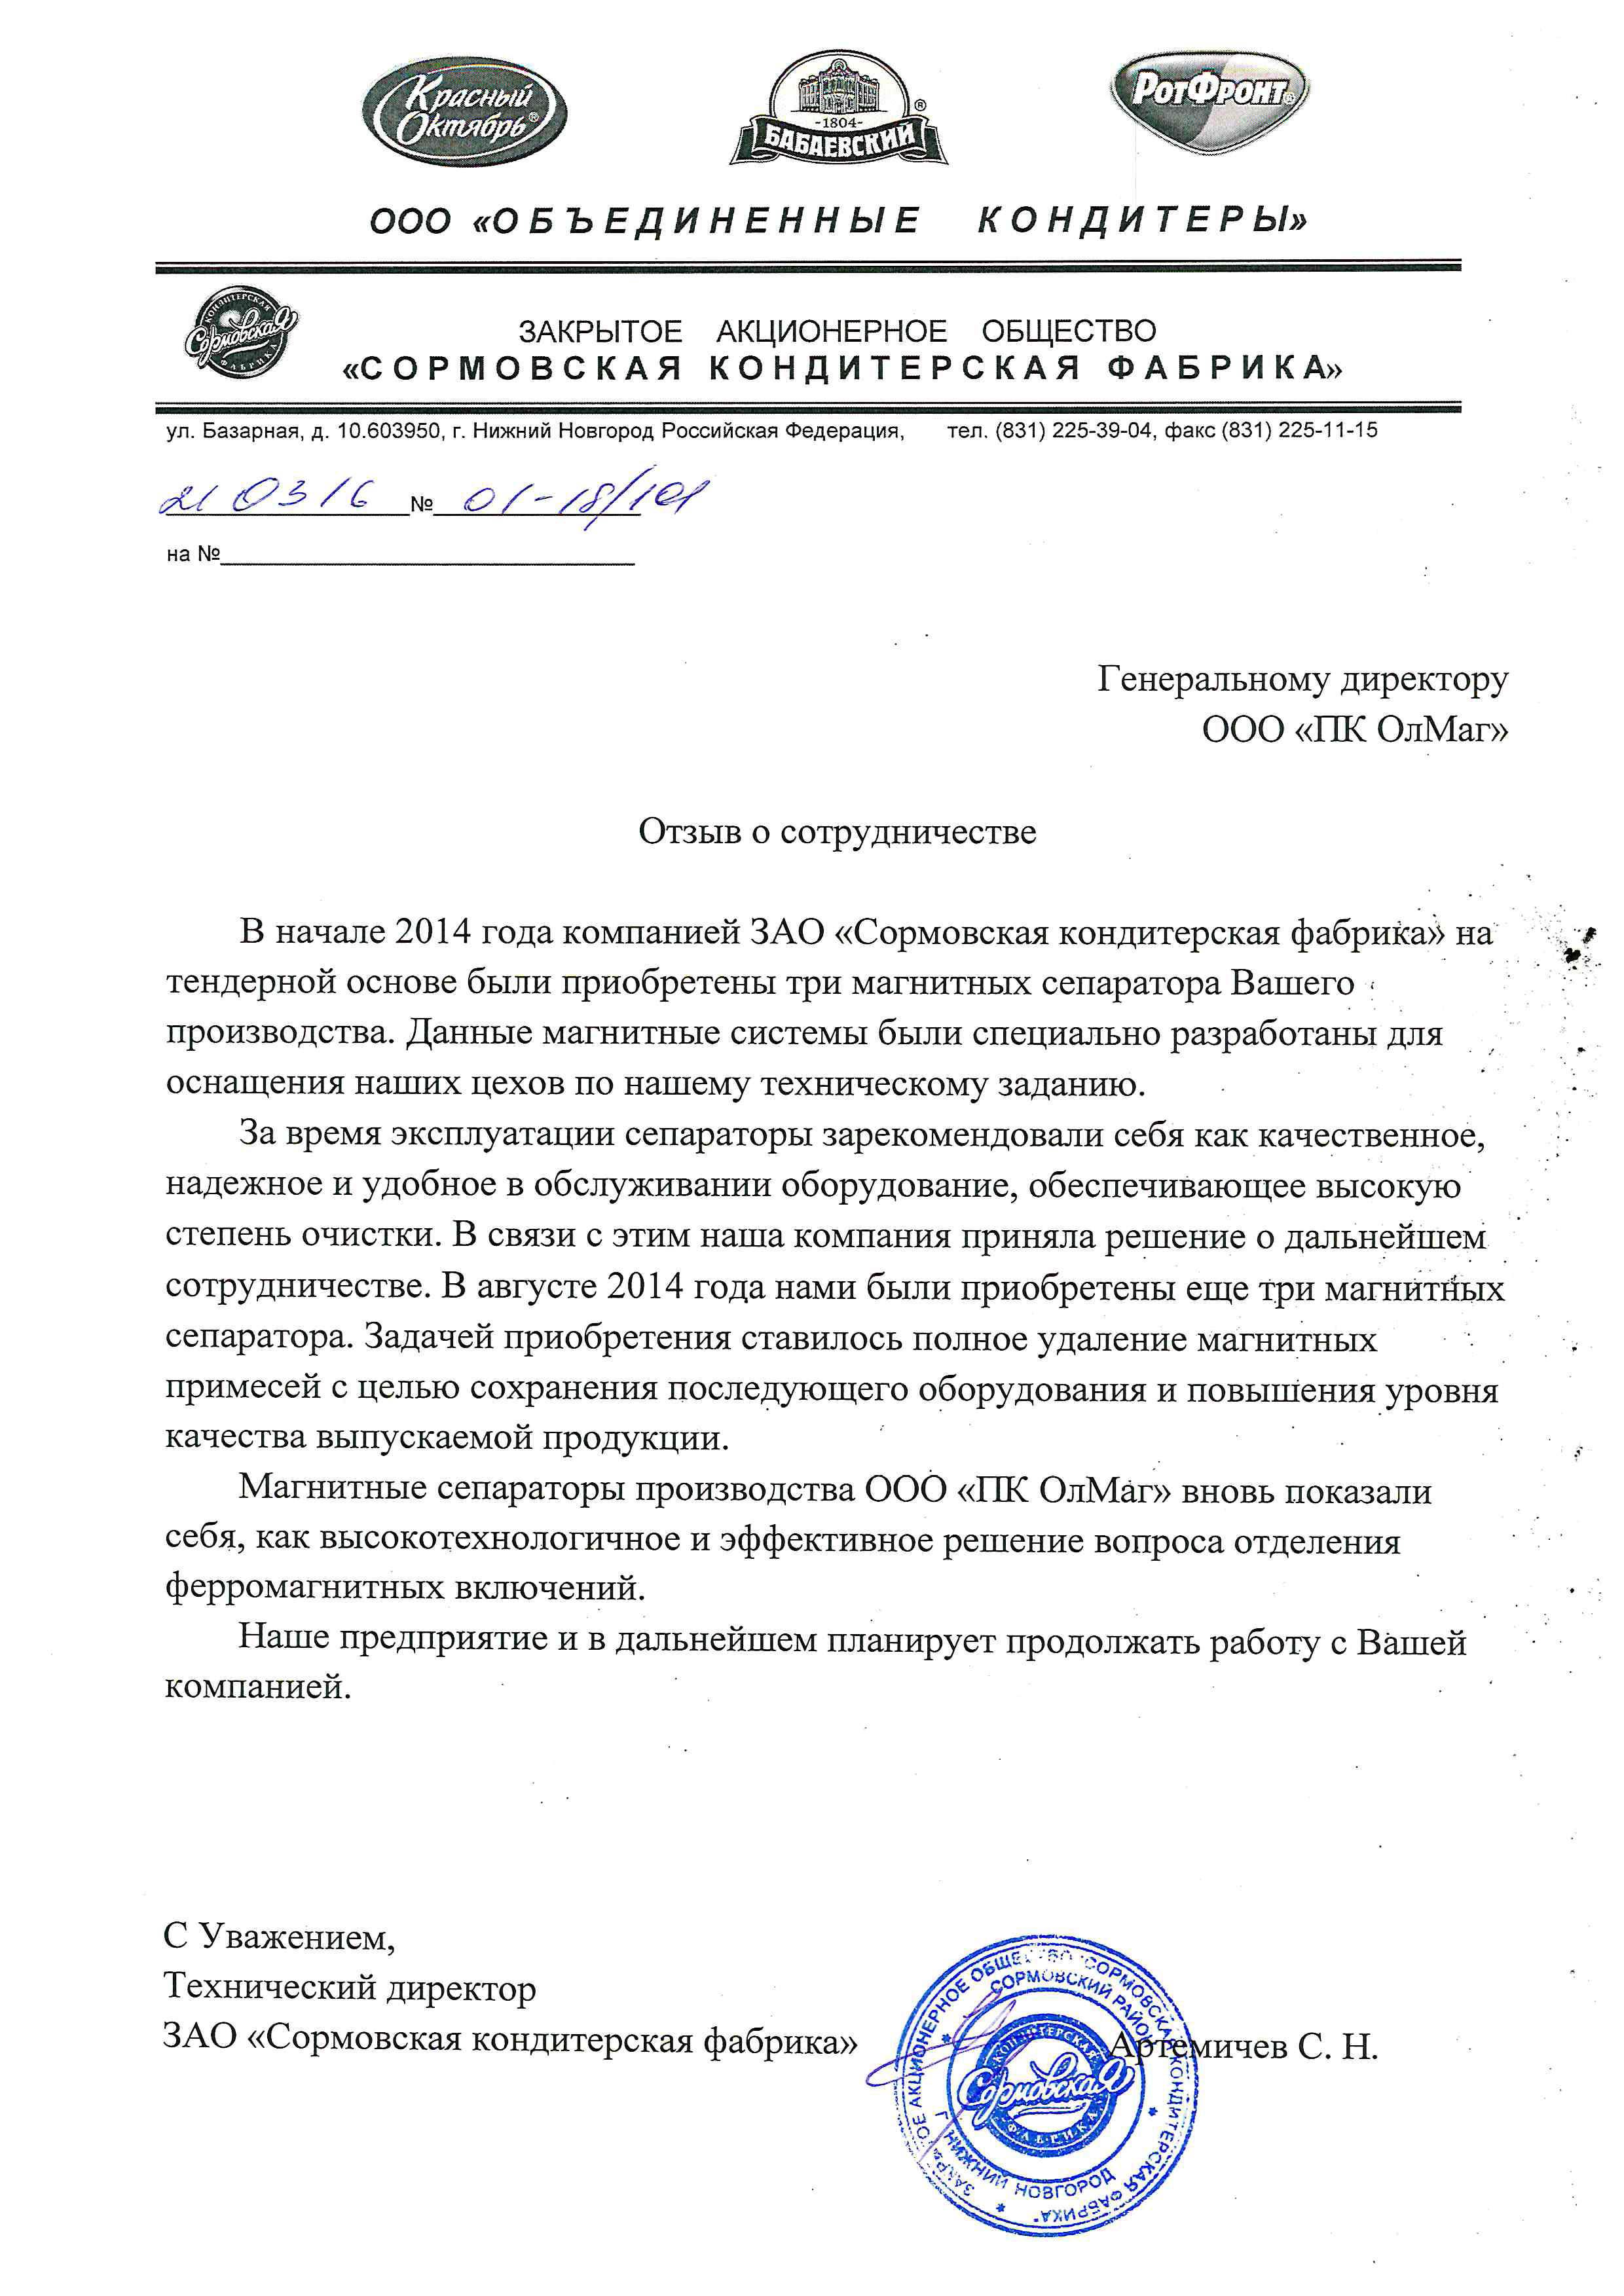 sormovskay konditerskay fabrika-2